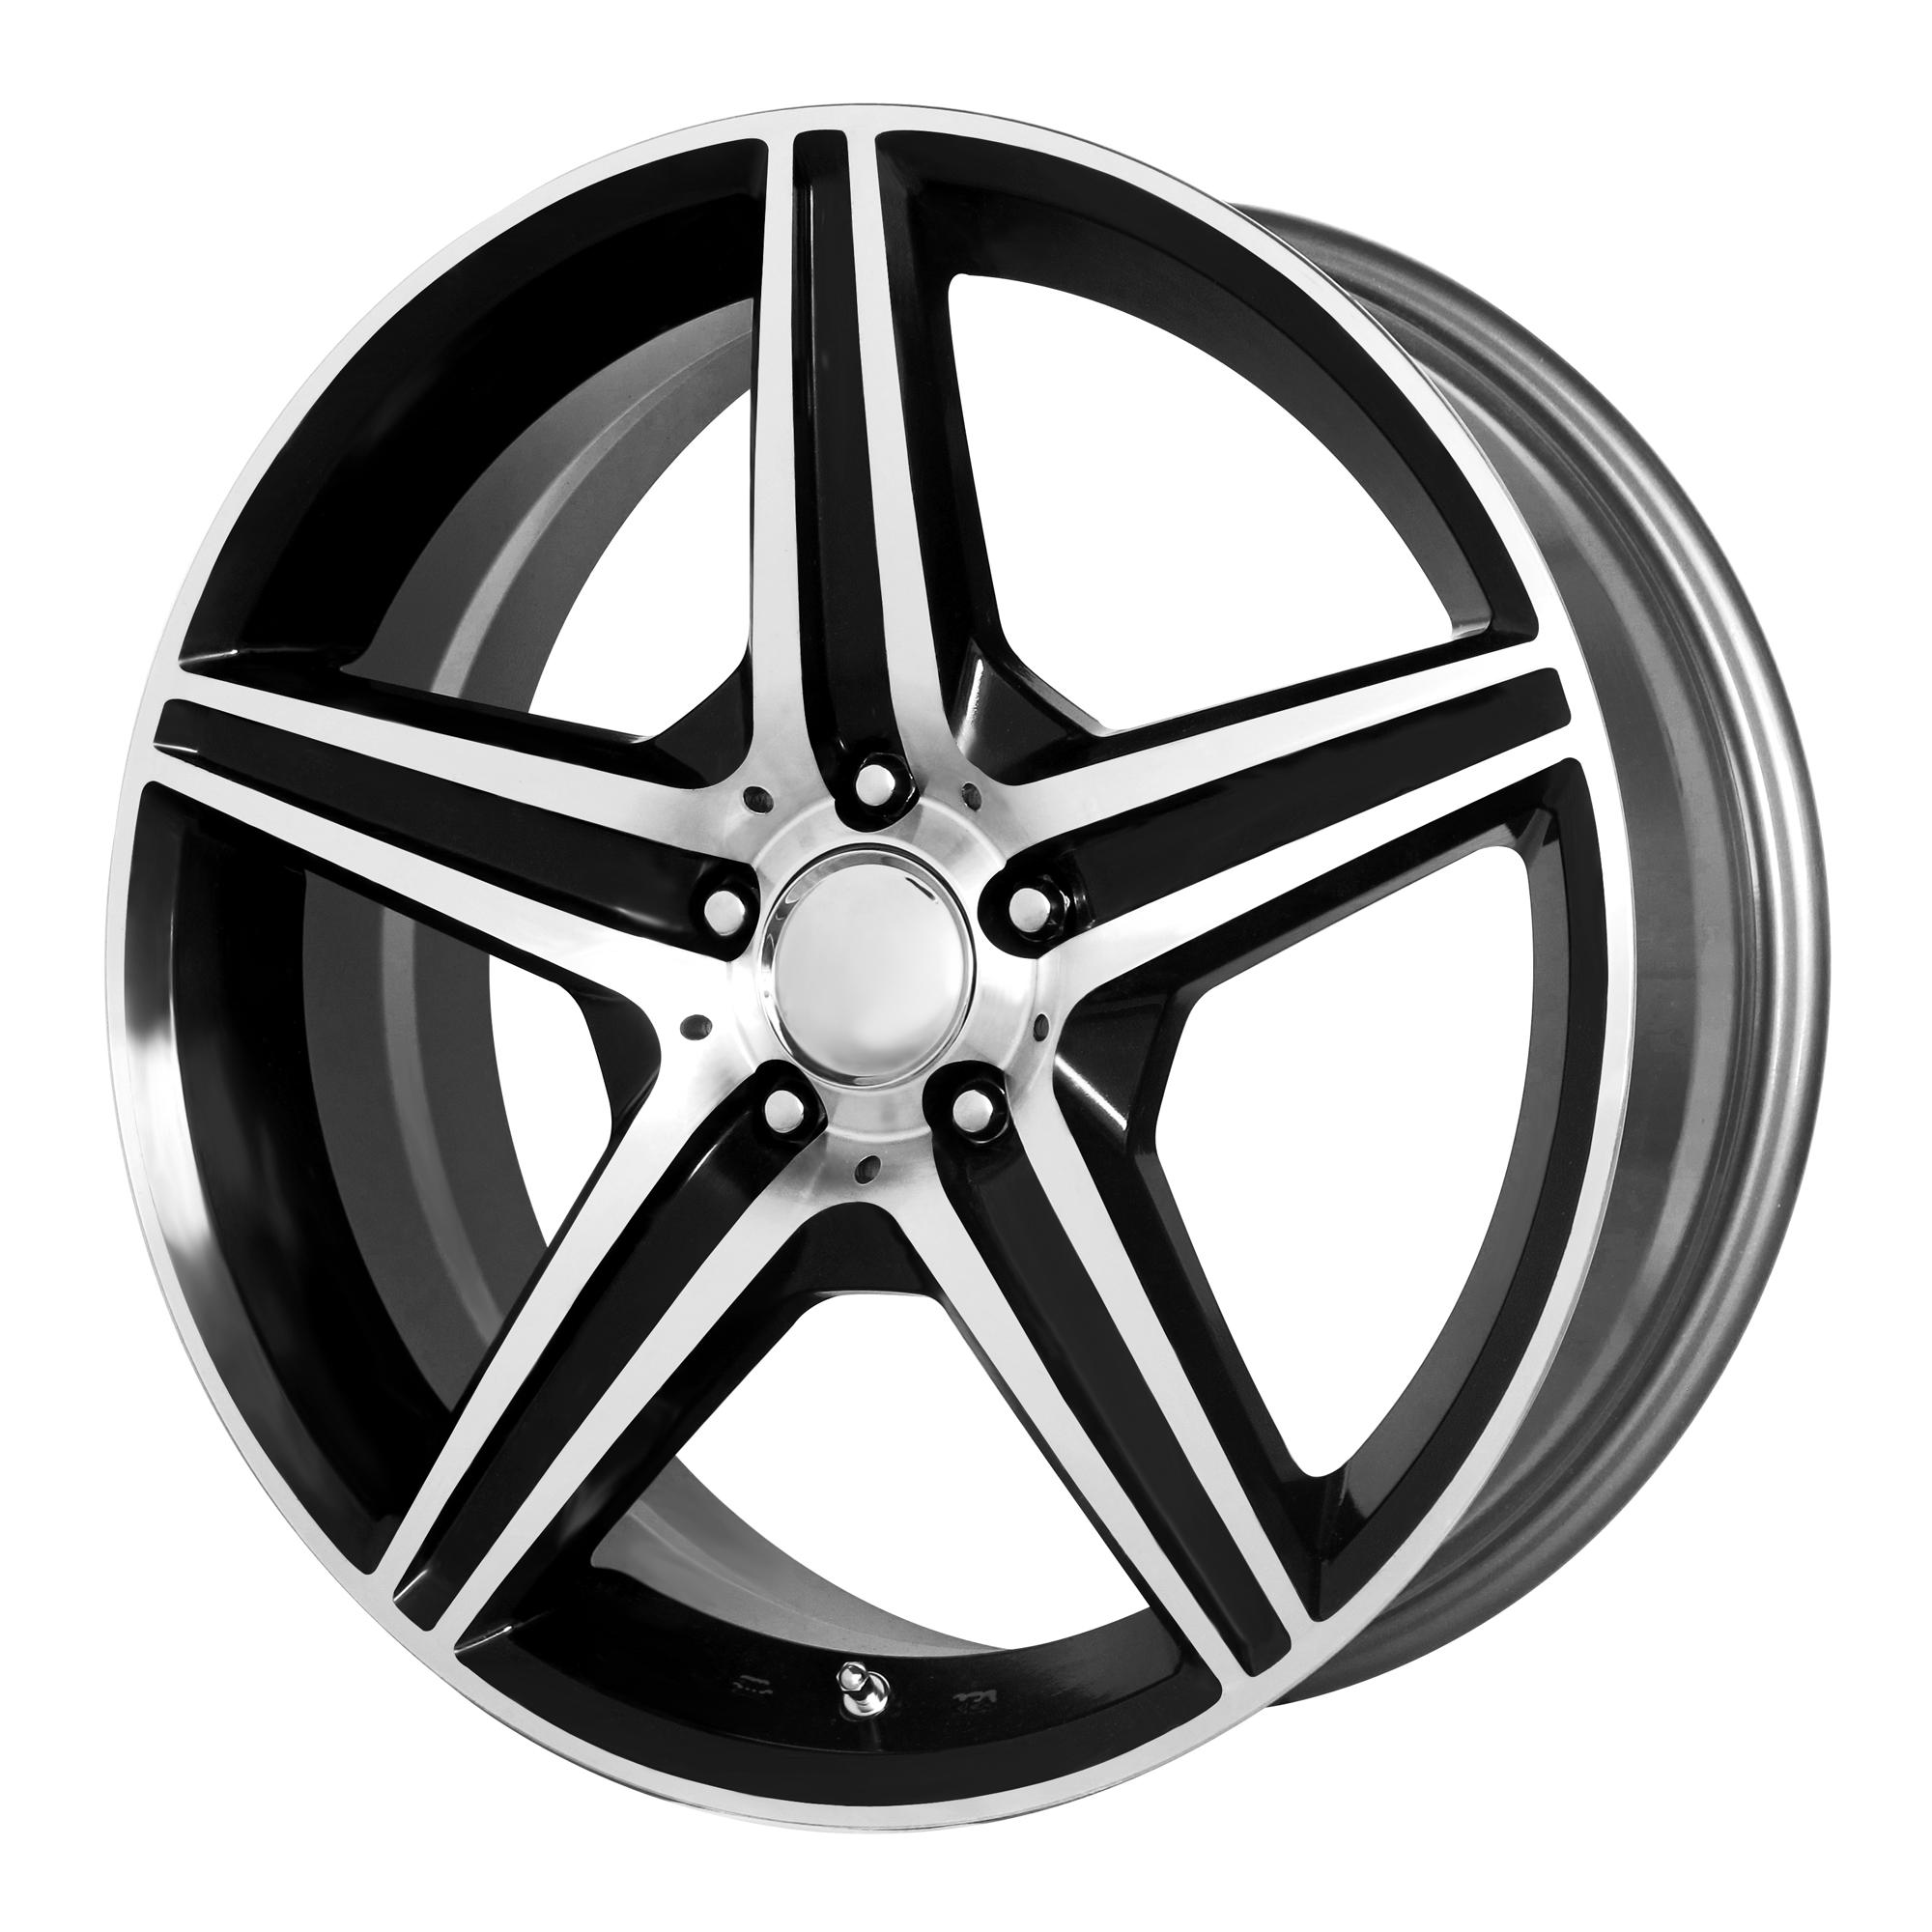 OE Creations Replica Wheels OE Creations 115C Gloss Black w/ Machined Spokes & Lip